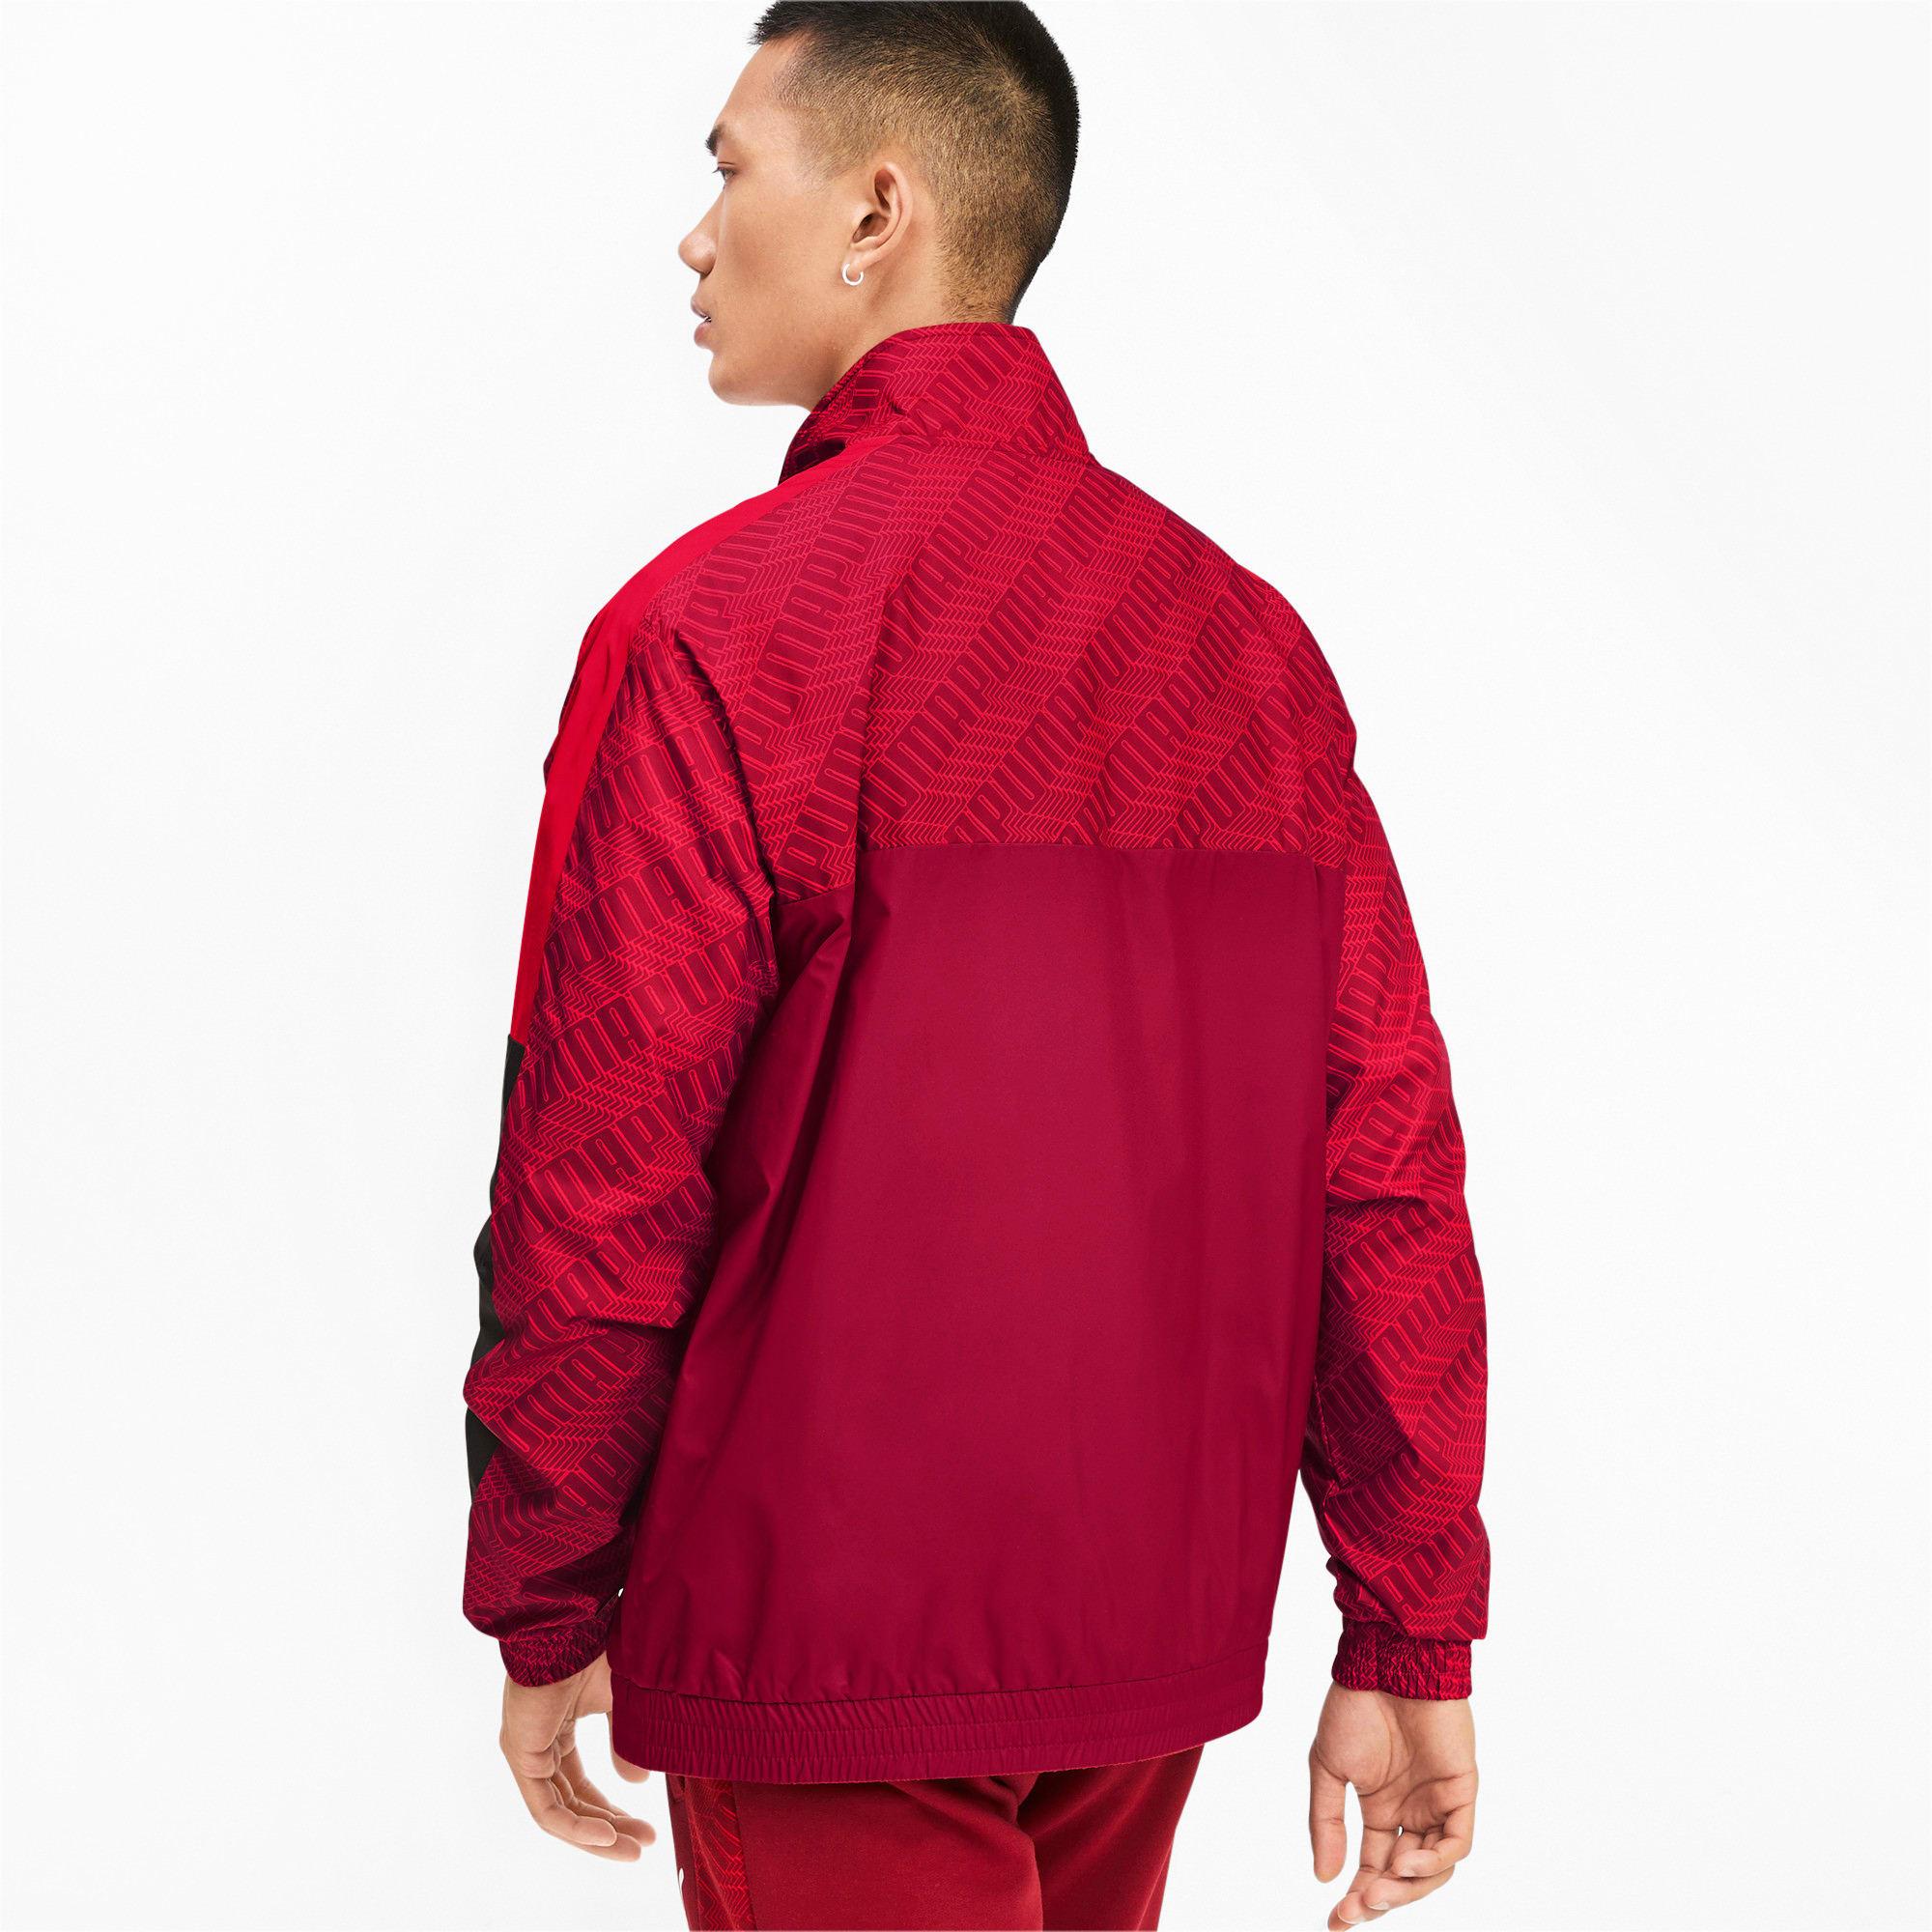 Thumbnail 3 of T7 Men's AOP Track Jacket, Rhubarb-Repeat logo, medium